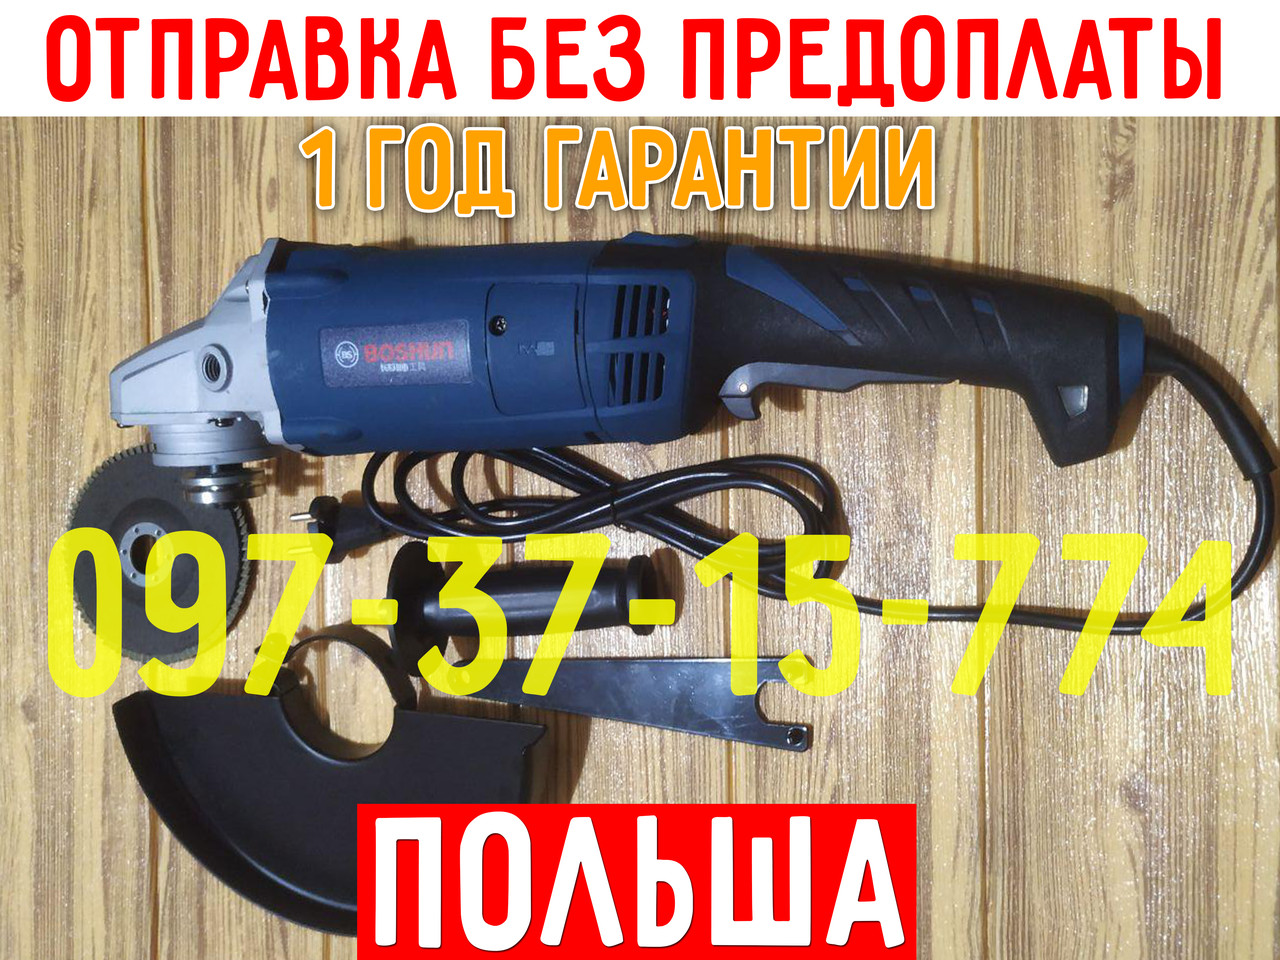 Електрична Кутова Шліфувальна Машина Boshun BS7230H | ПОЛЬЩА | 230мм (9дюймов) | Болгарка Boshun BS7230H